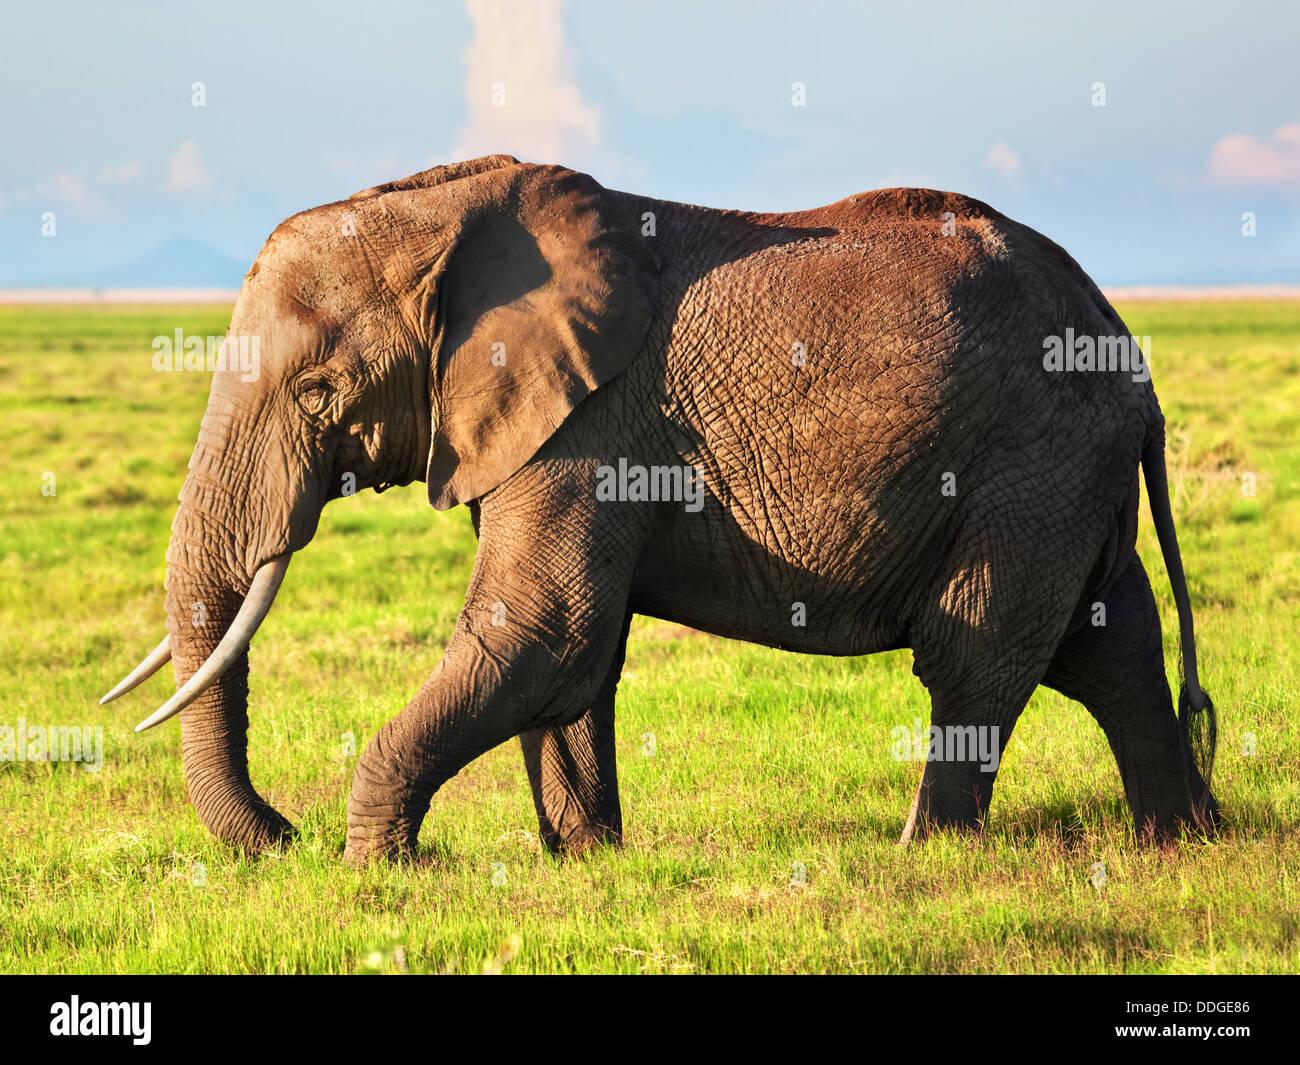 Elefante africano (Loxodonta africana) ritratto in Amboseli National Park, Rift Valley, Kenya, Africa Immagini Stock